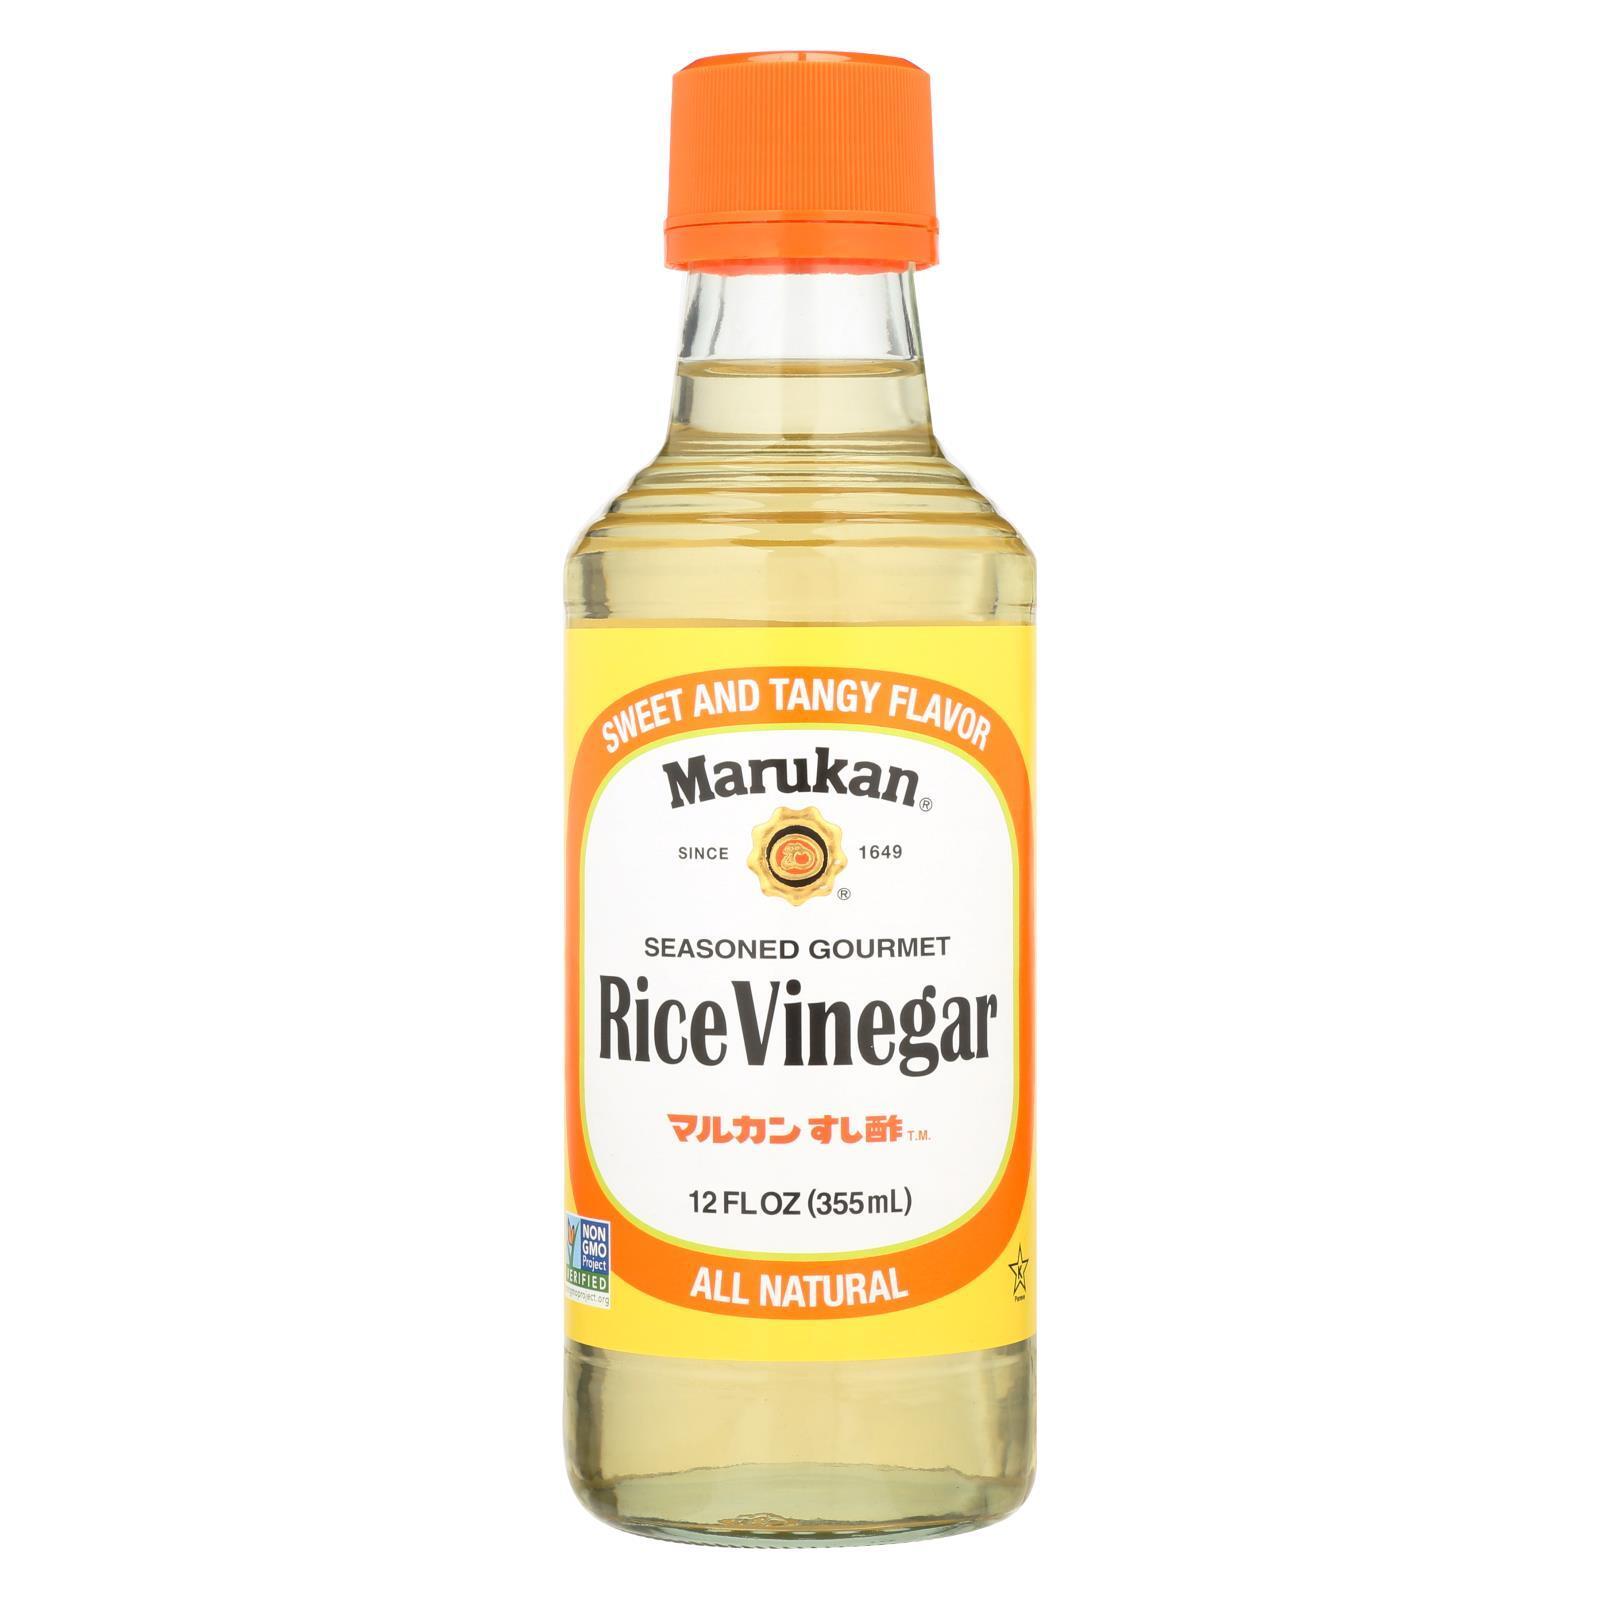 Marukan Seasoned Gourmet - Rice Vinegar - Case of 6 - 12 Fl oz.